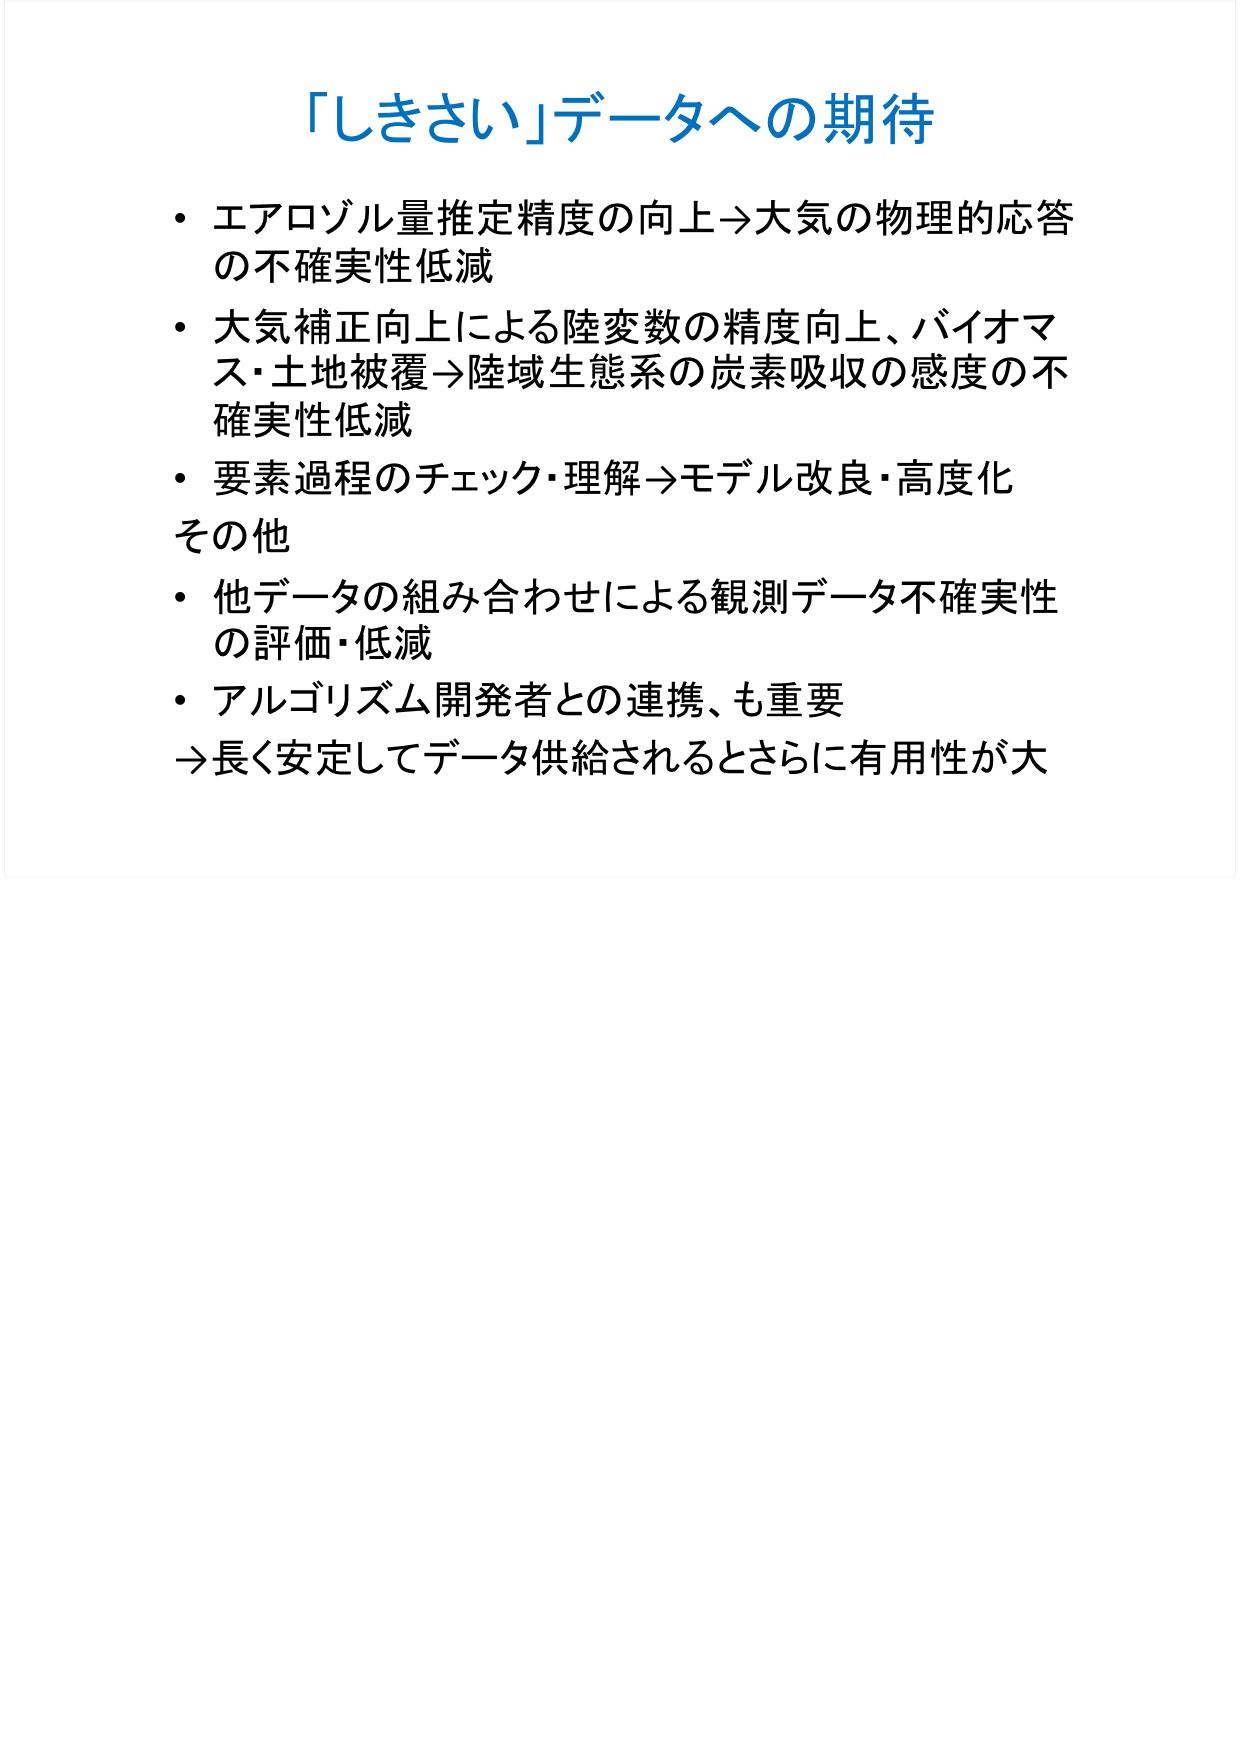 f:id:Imamura:20181220152522p:plain